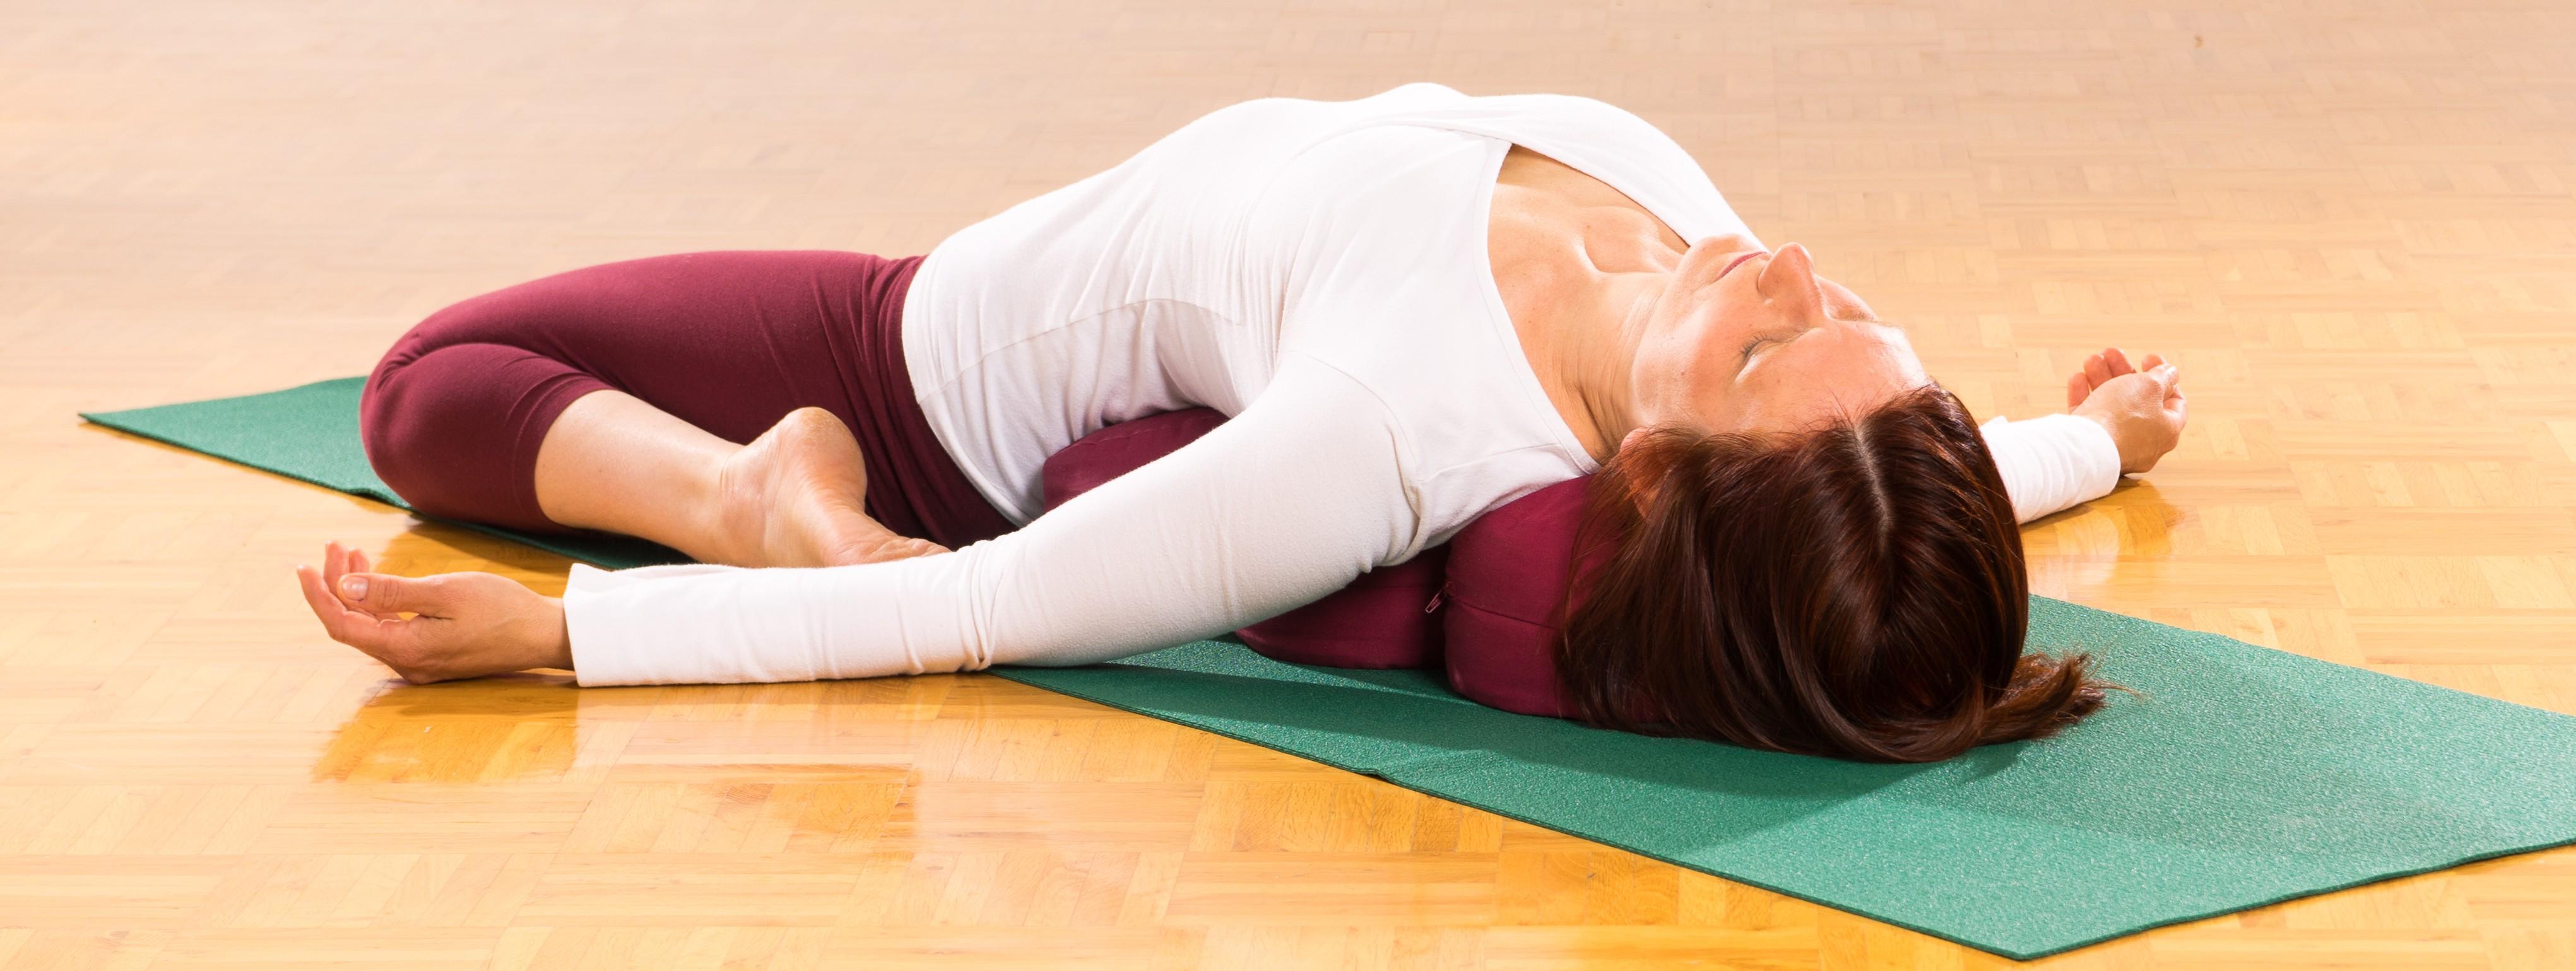 Yin Yoga - Yoga bewusst leben